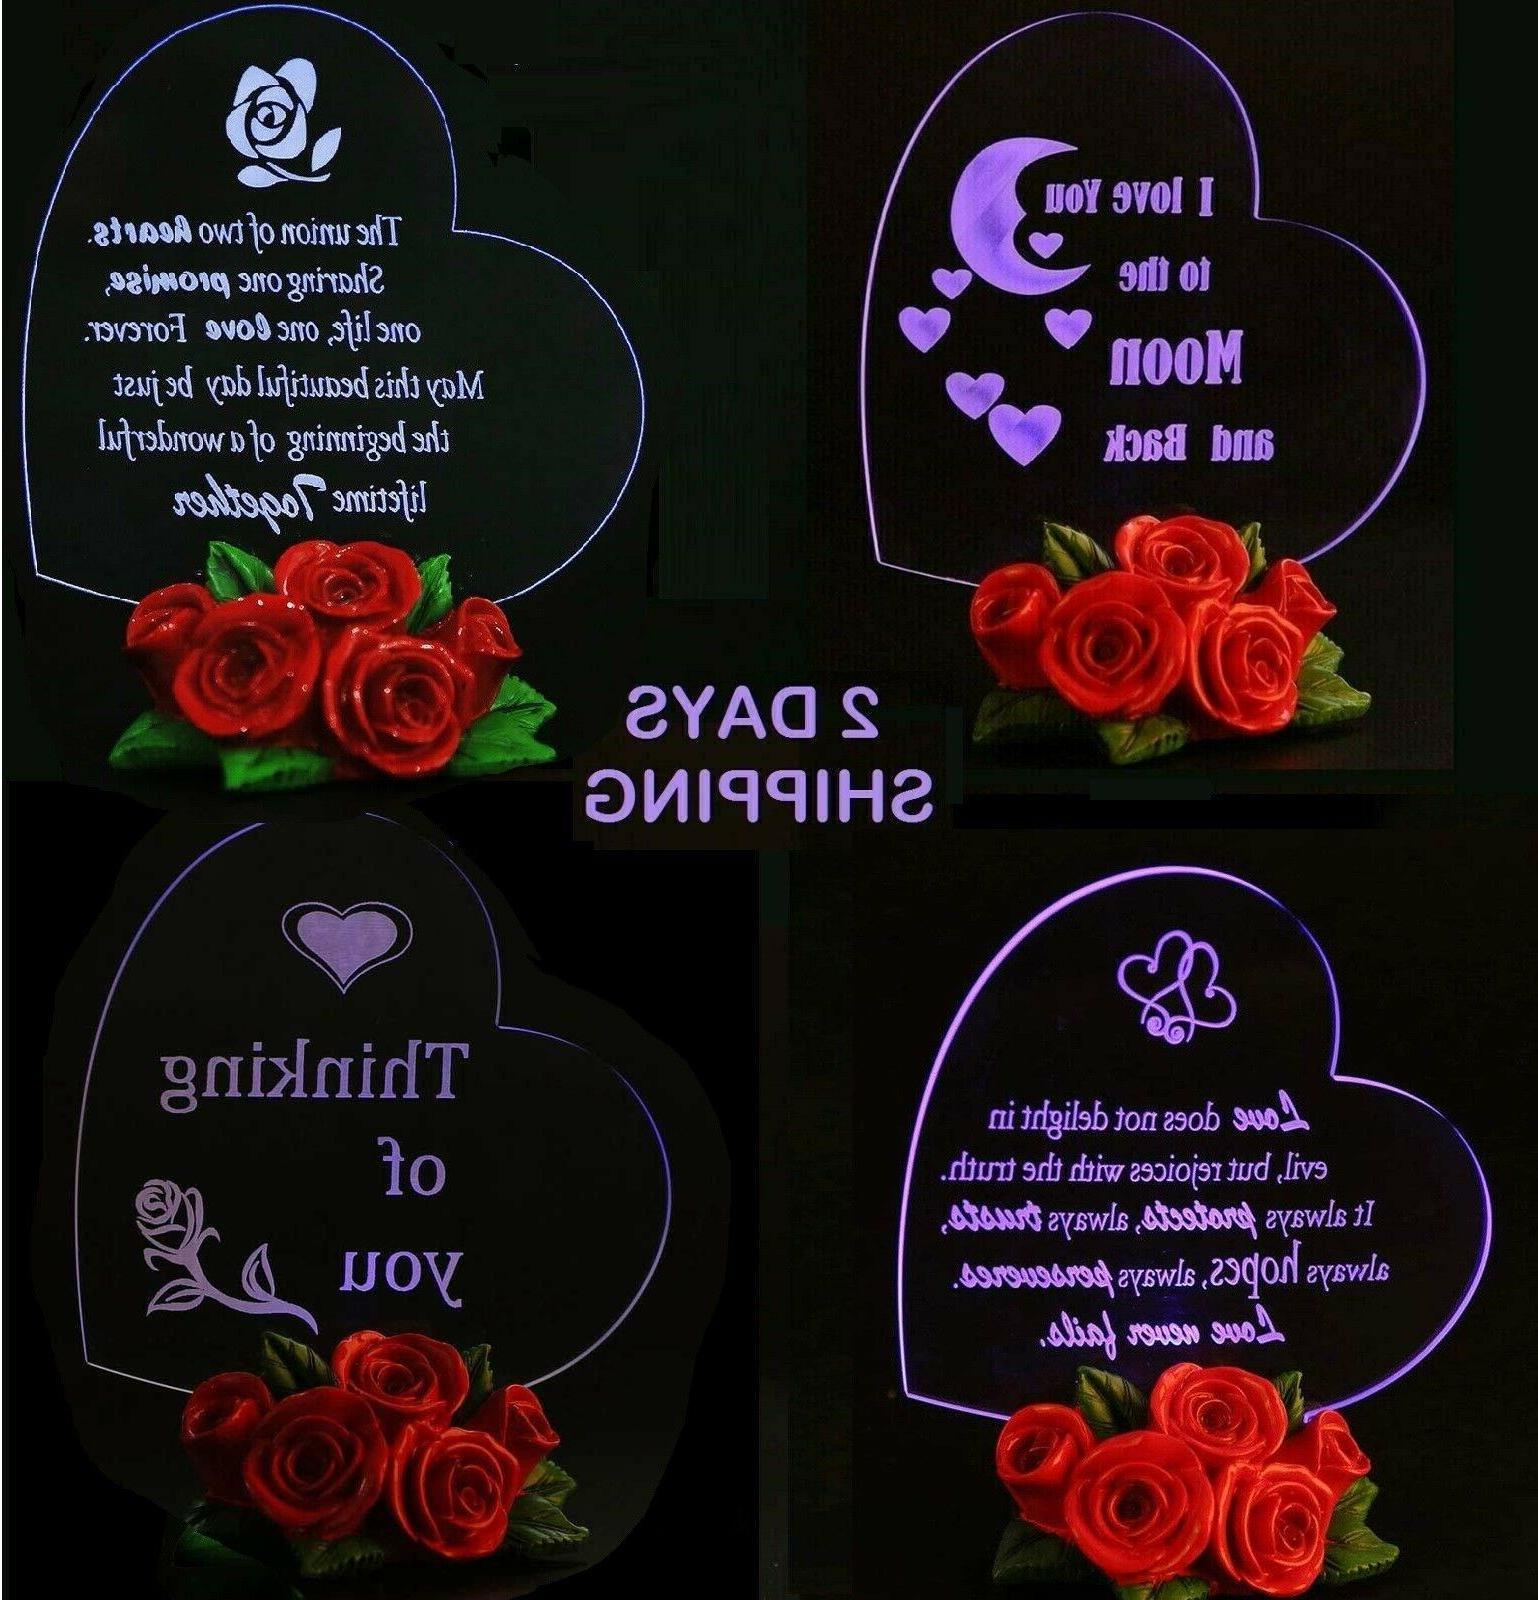 valentines day gift for her led light